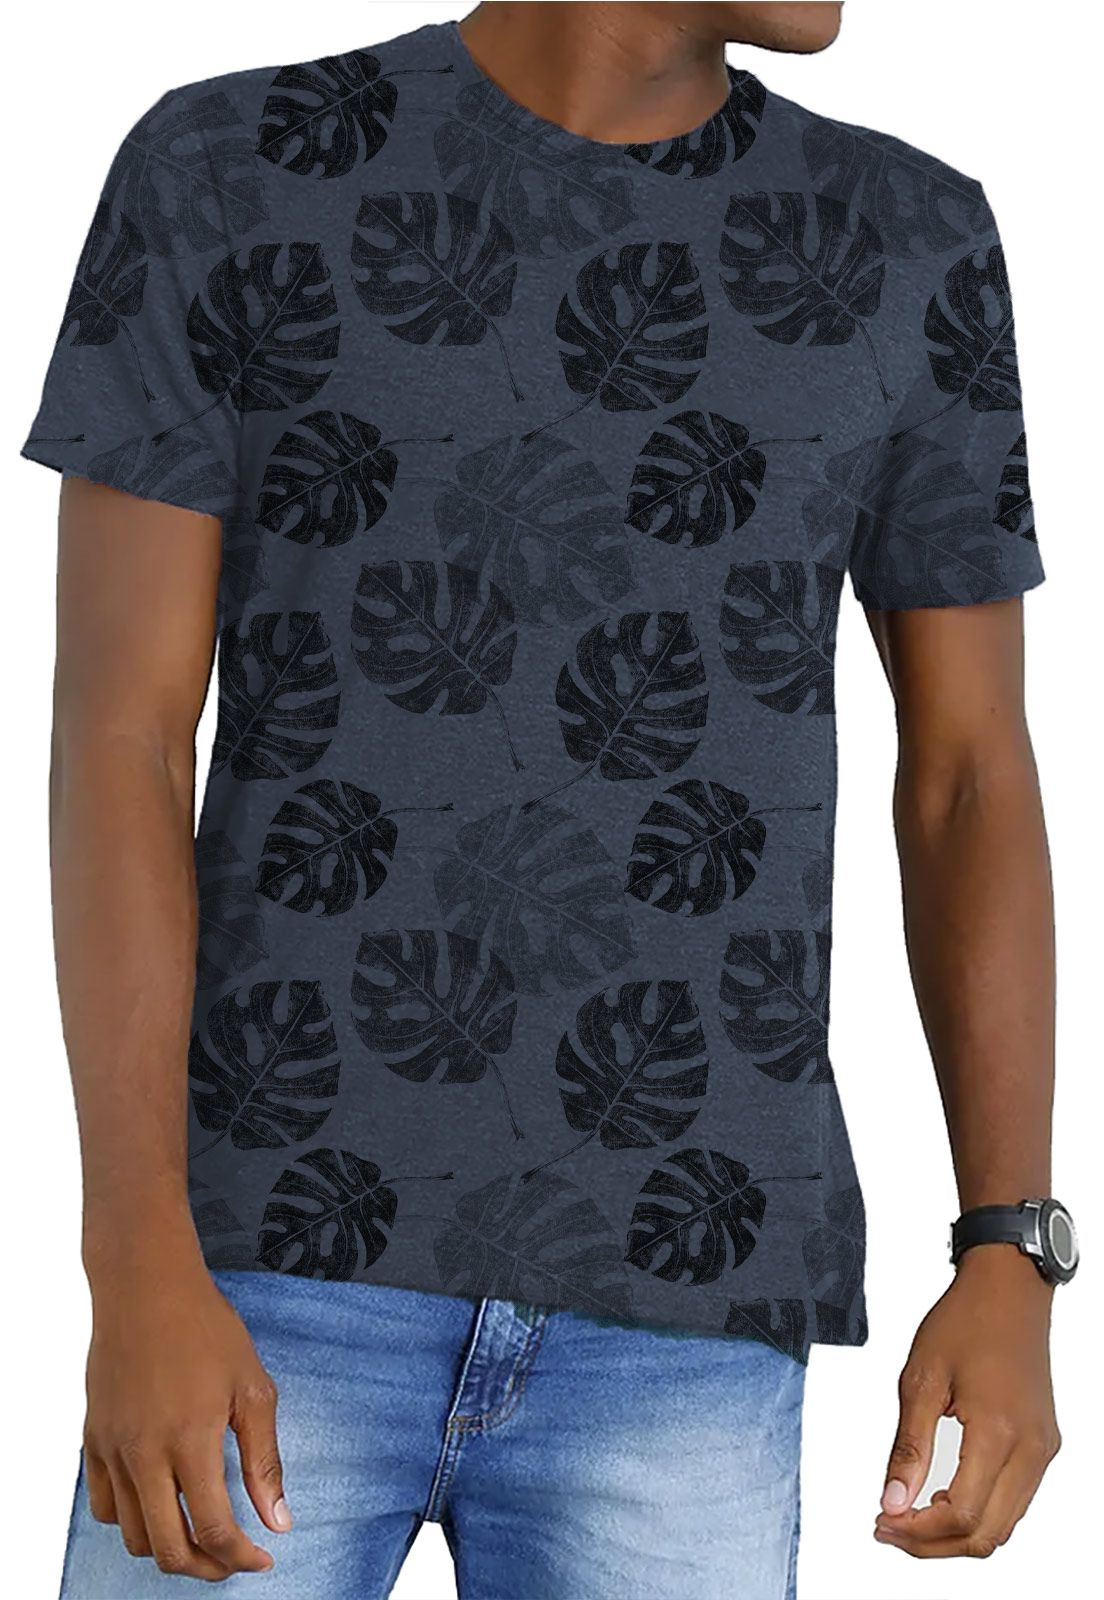 Camiseta Amazônia Garrafa Pet Corrido Costela de Adão - Azul Escuro